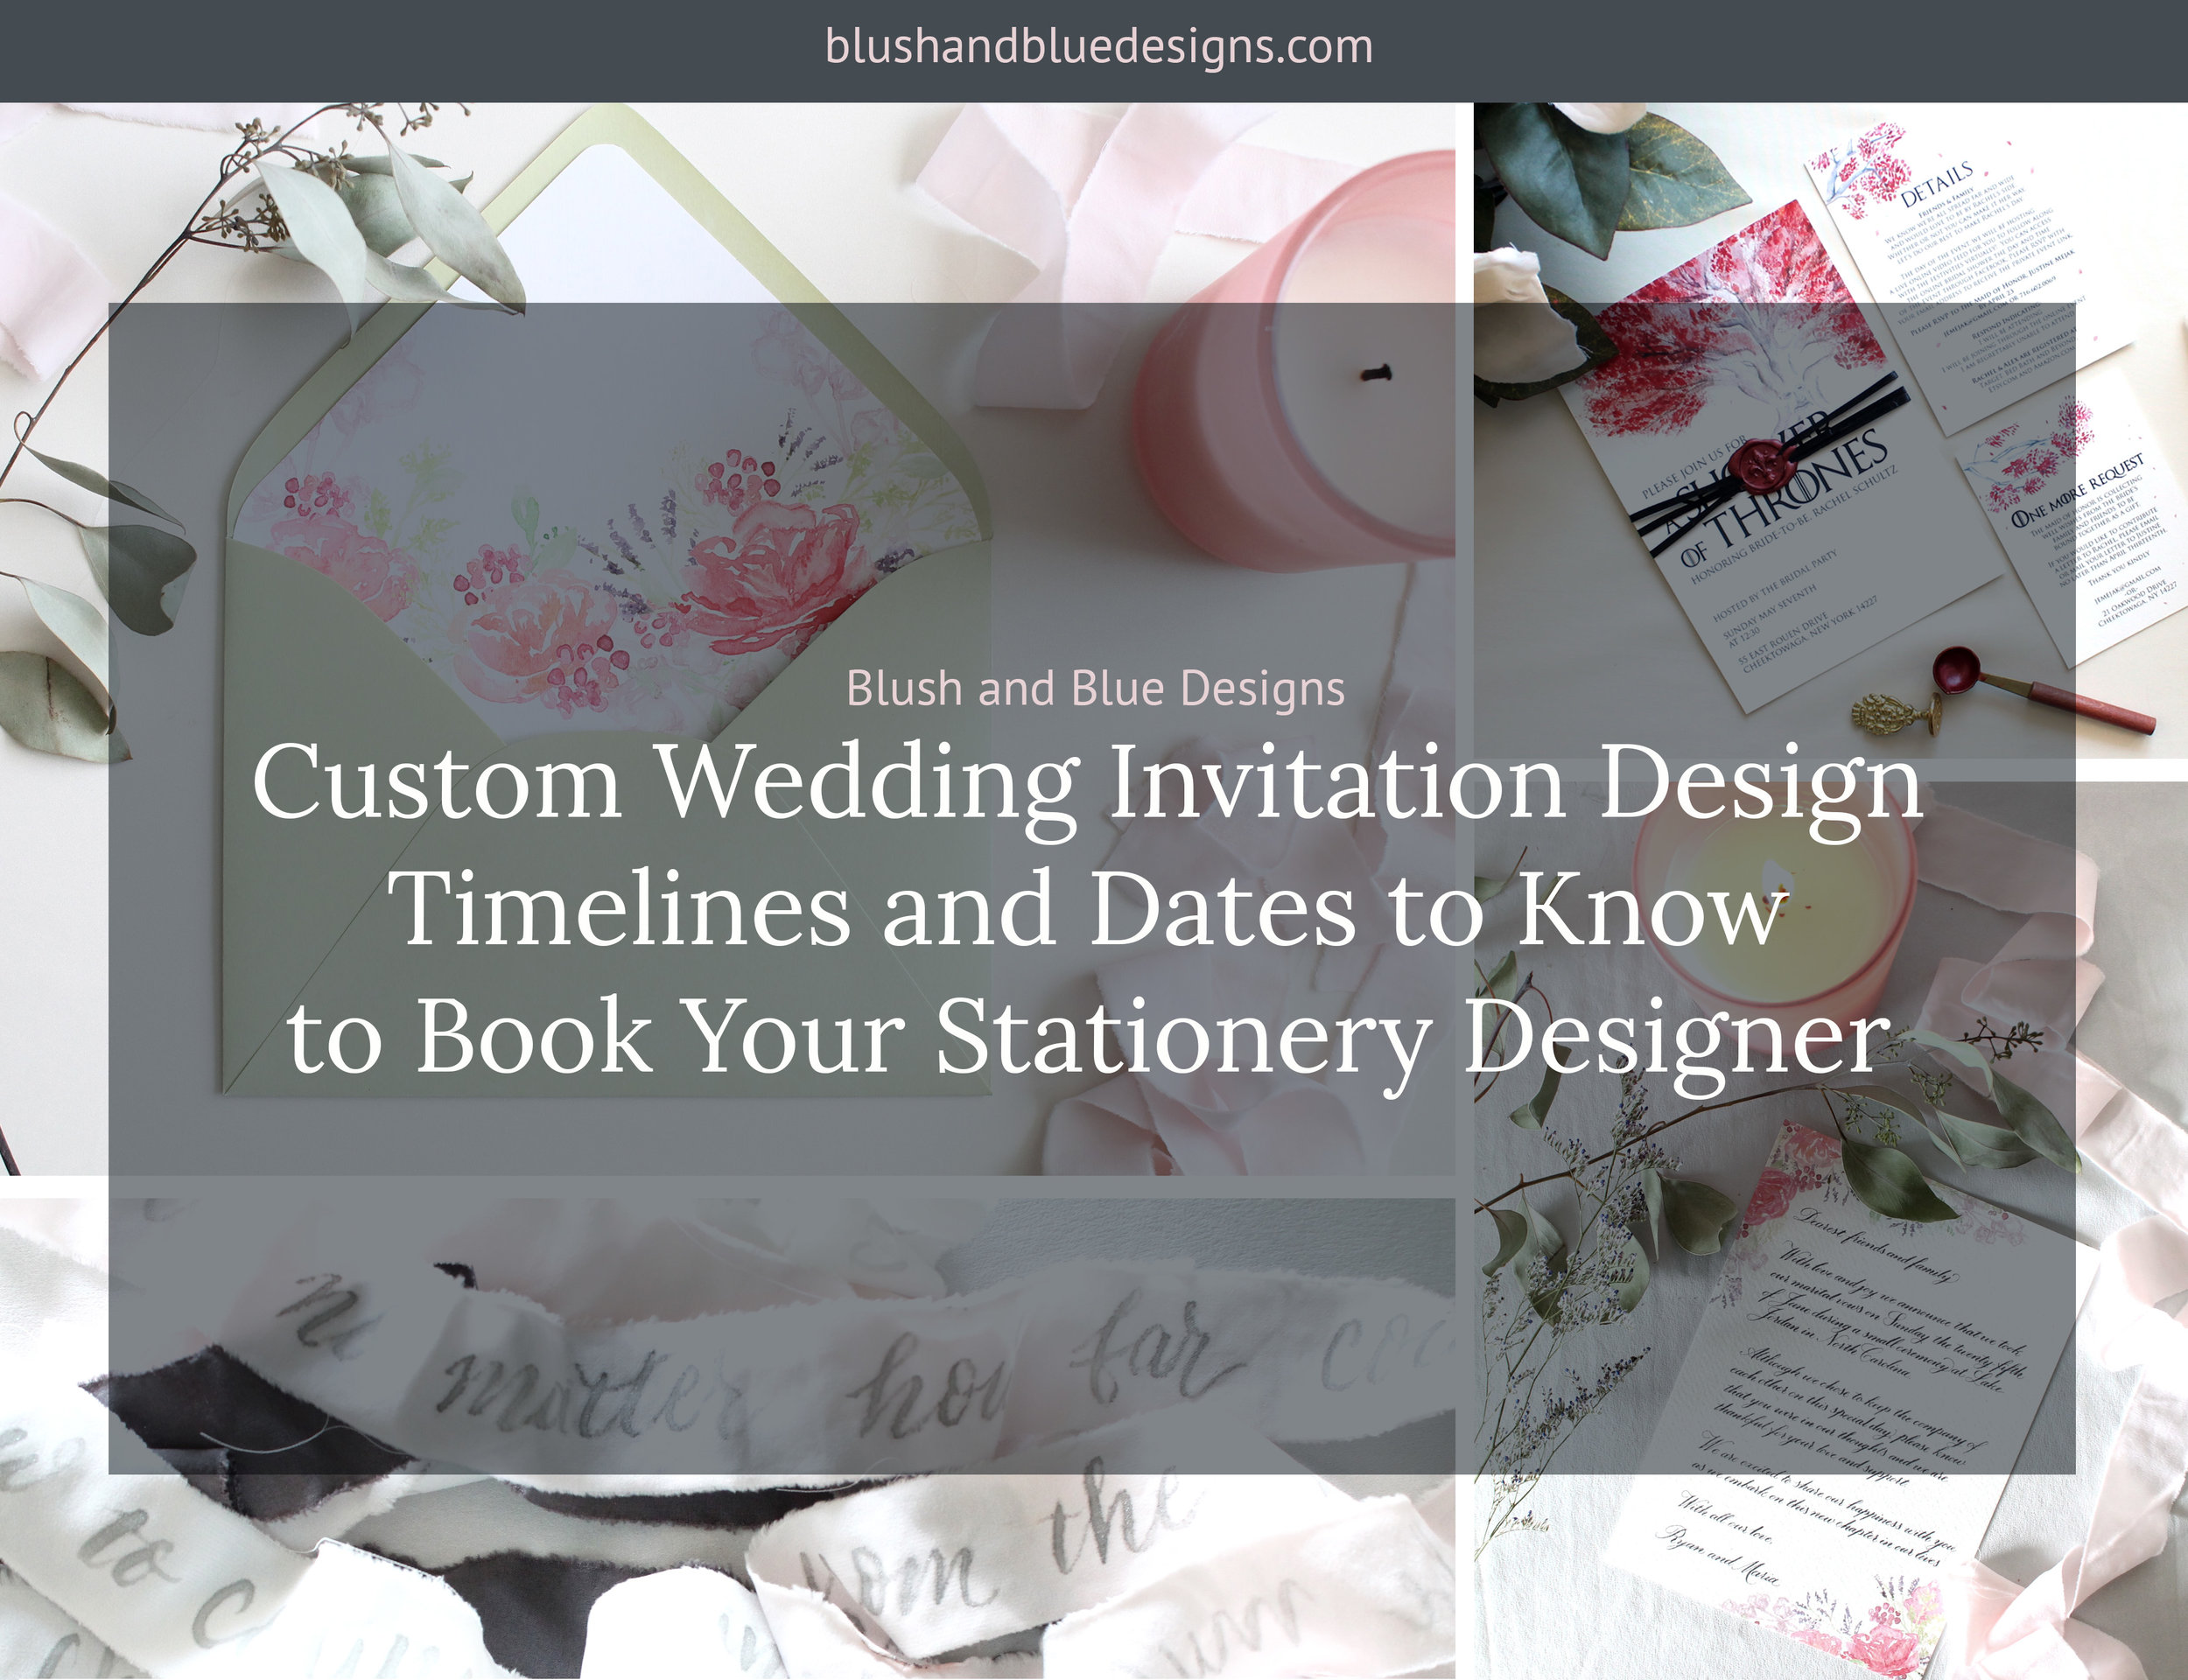 Custom wedding invitation design timeline